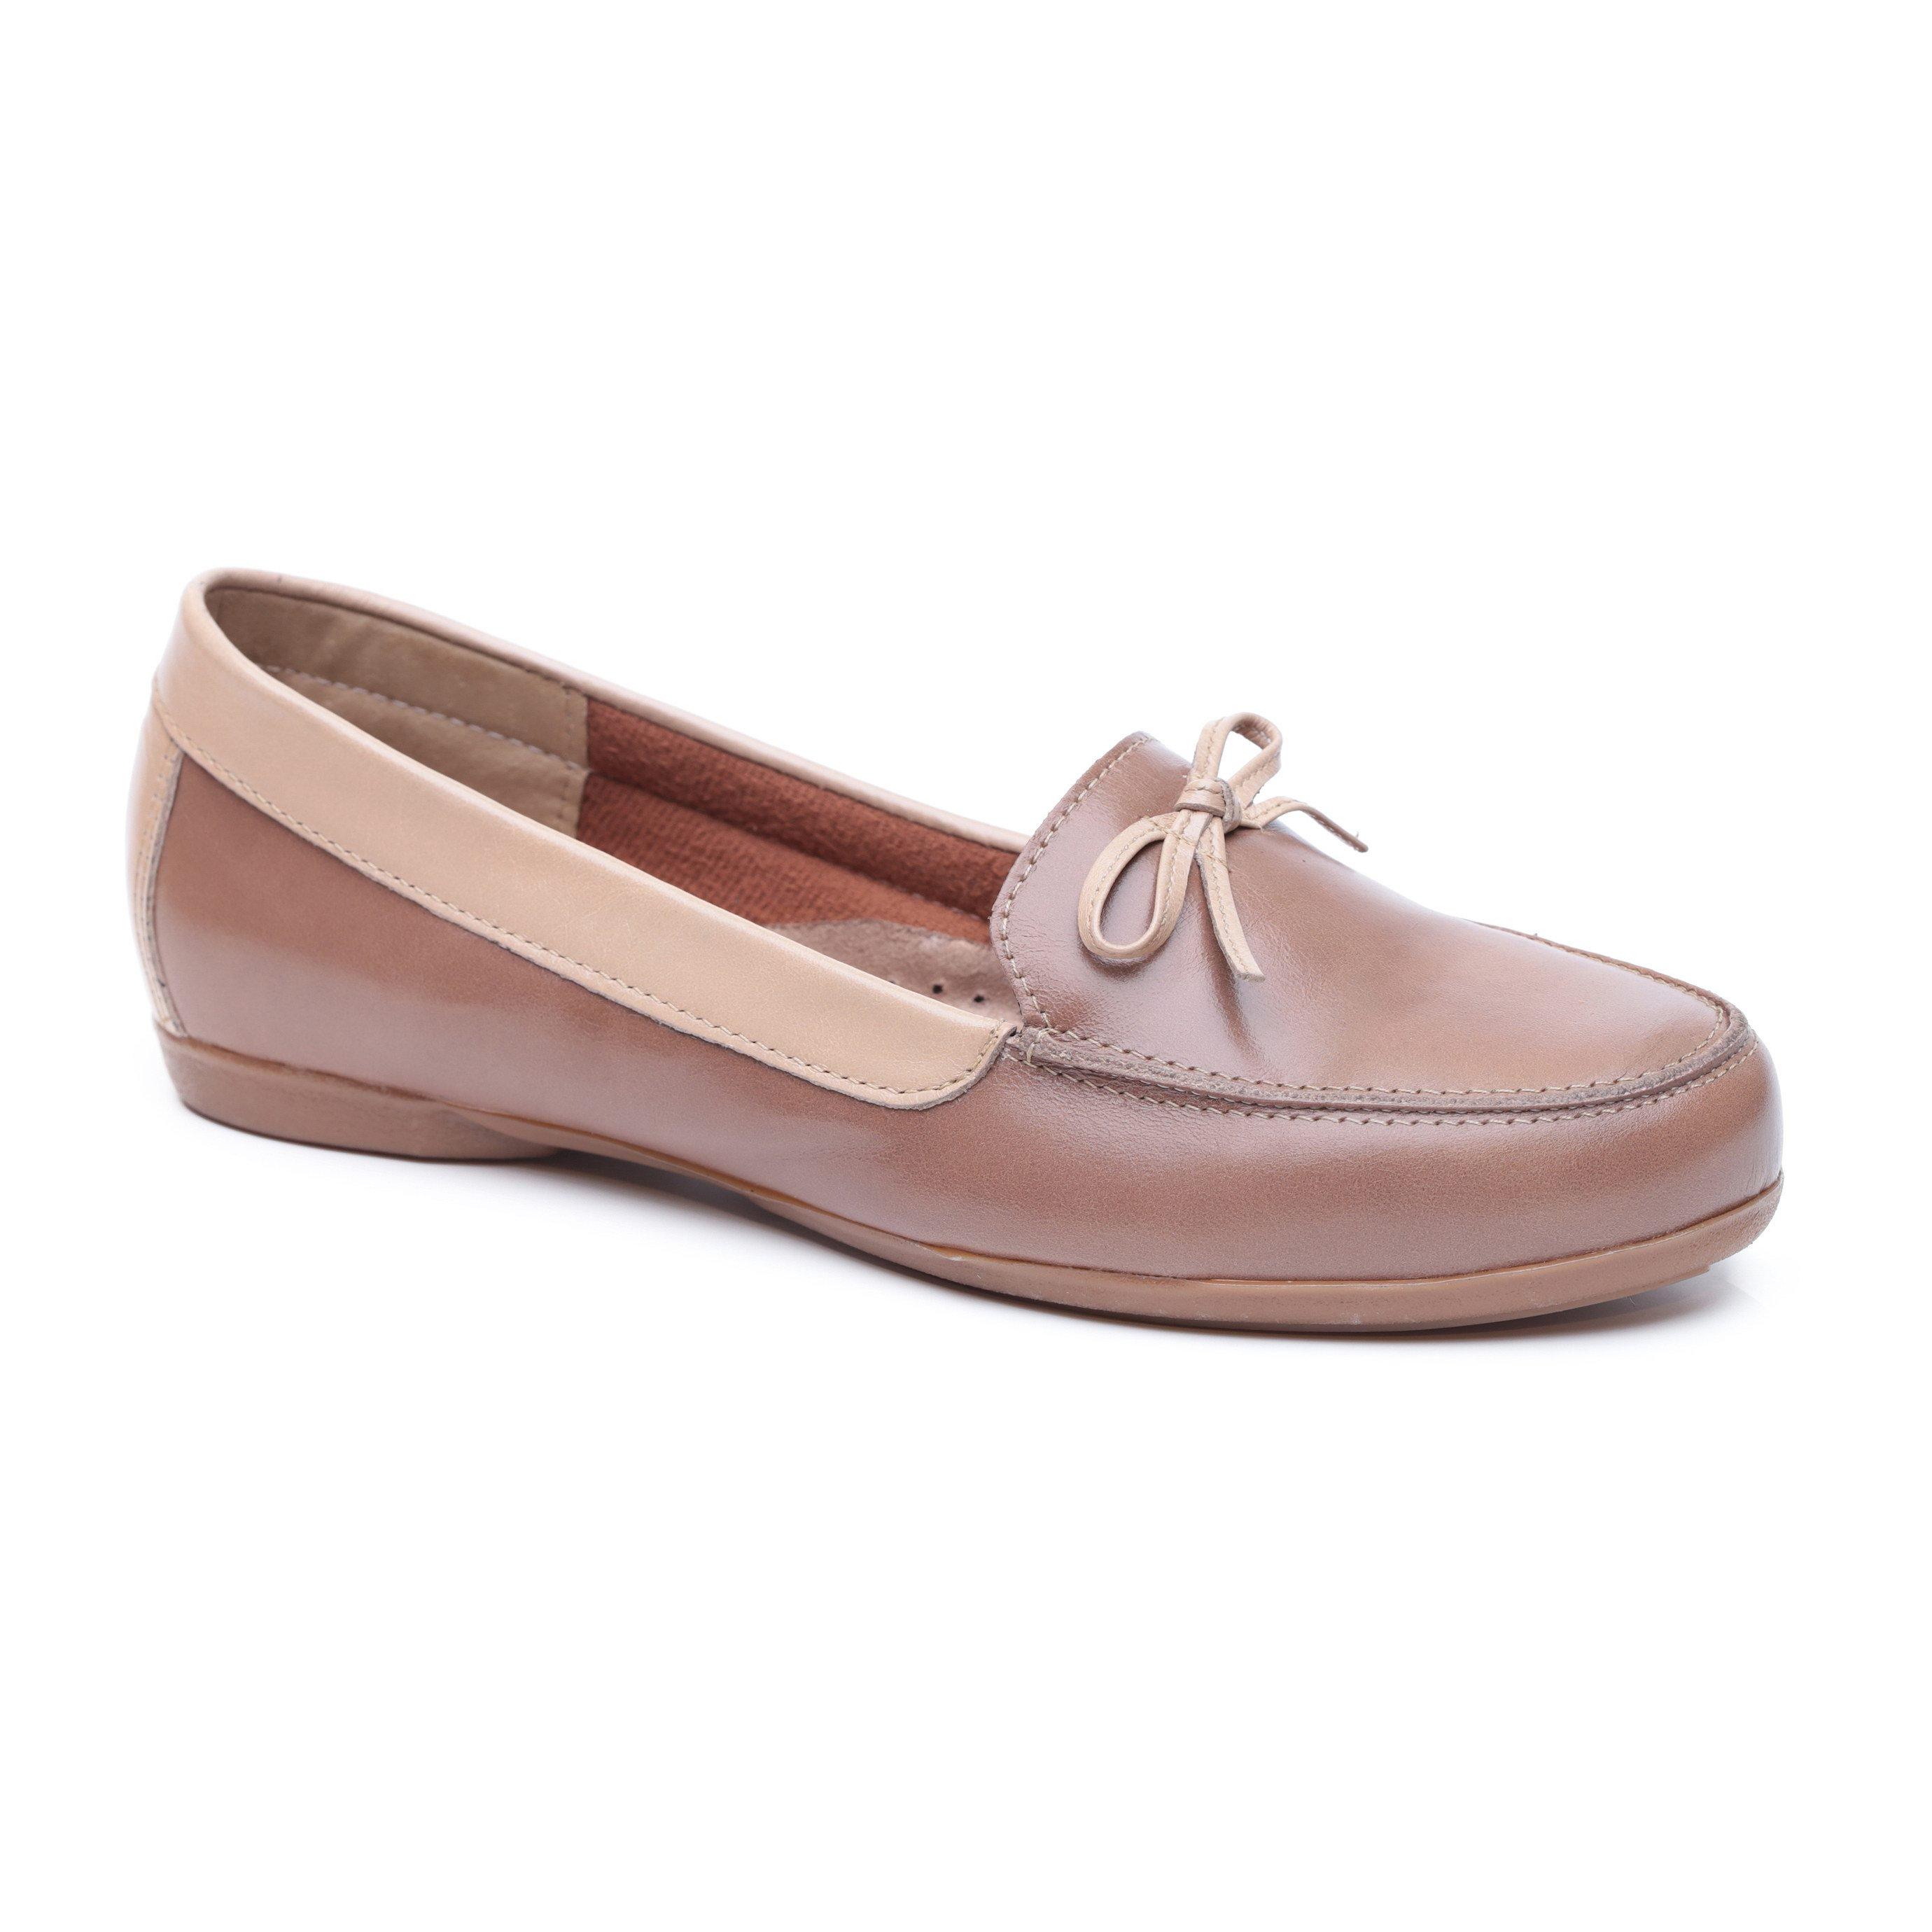 Seventy Nine - נעלי מוקסין שטוחות לנשים בסגנון רטרו בצבע קאמל